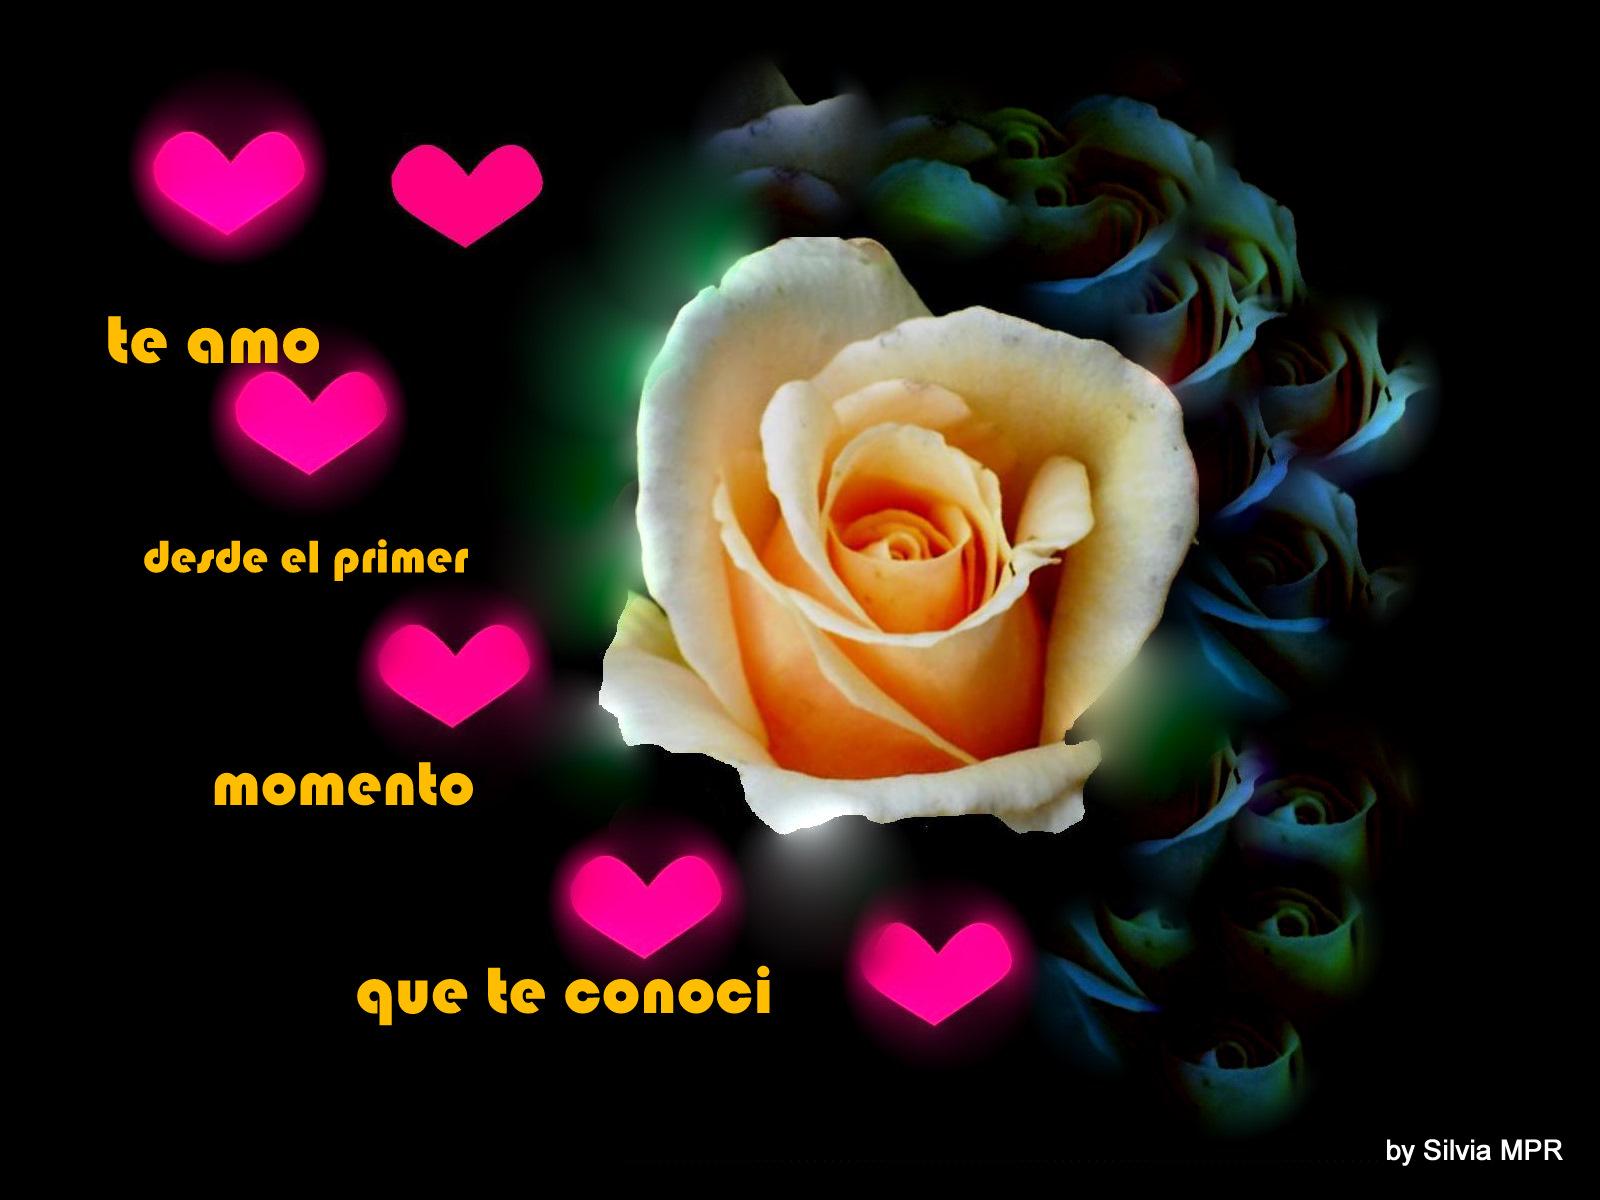 http://2.bp.blogspot.com/-Dr8hacr3-O8/Tdf36dVPlJI/AAAAAAAAAAU/9EgUIJVGAz0/s1600/imagenes_de_amor_romanticas_con_corazones_te_amo_desde_el_primer_momento_en_que_te_conoci_28-05-2010_08-20-45_p_m__1600x1200.jpg